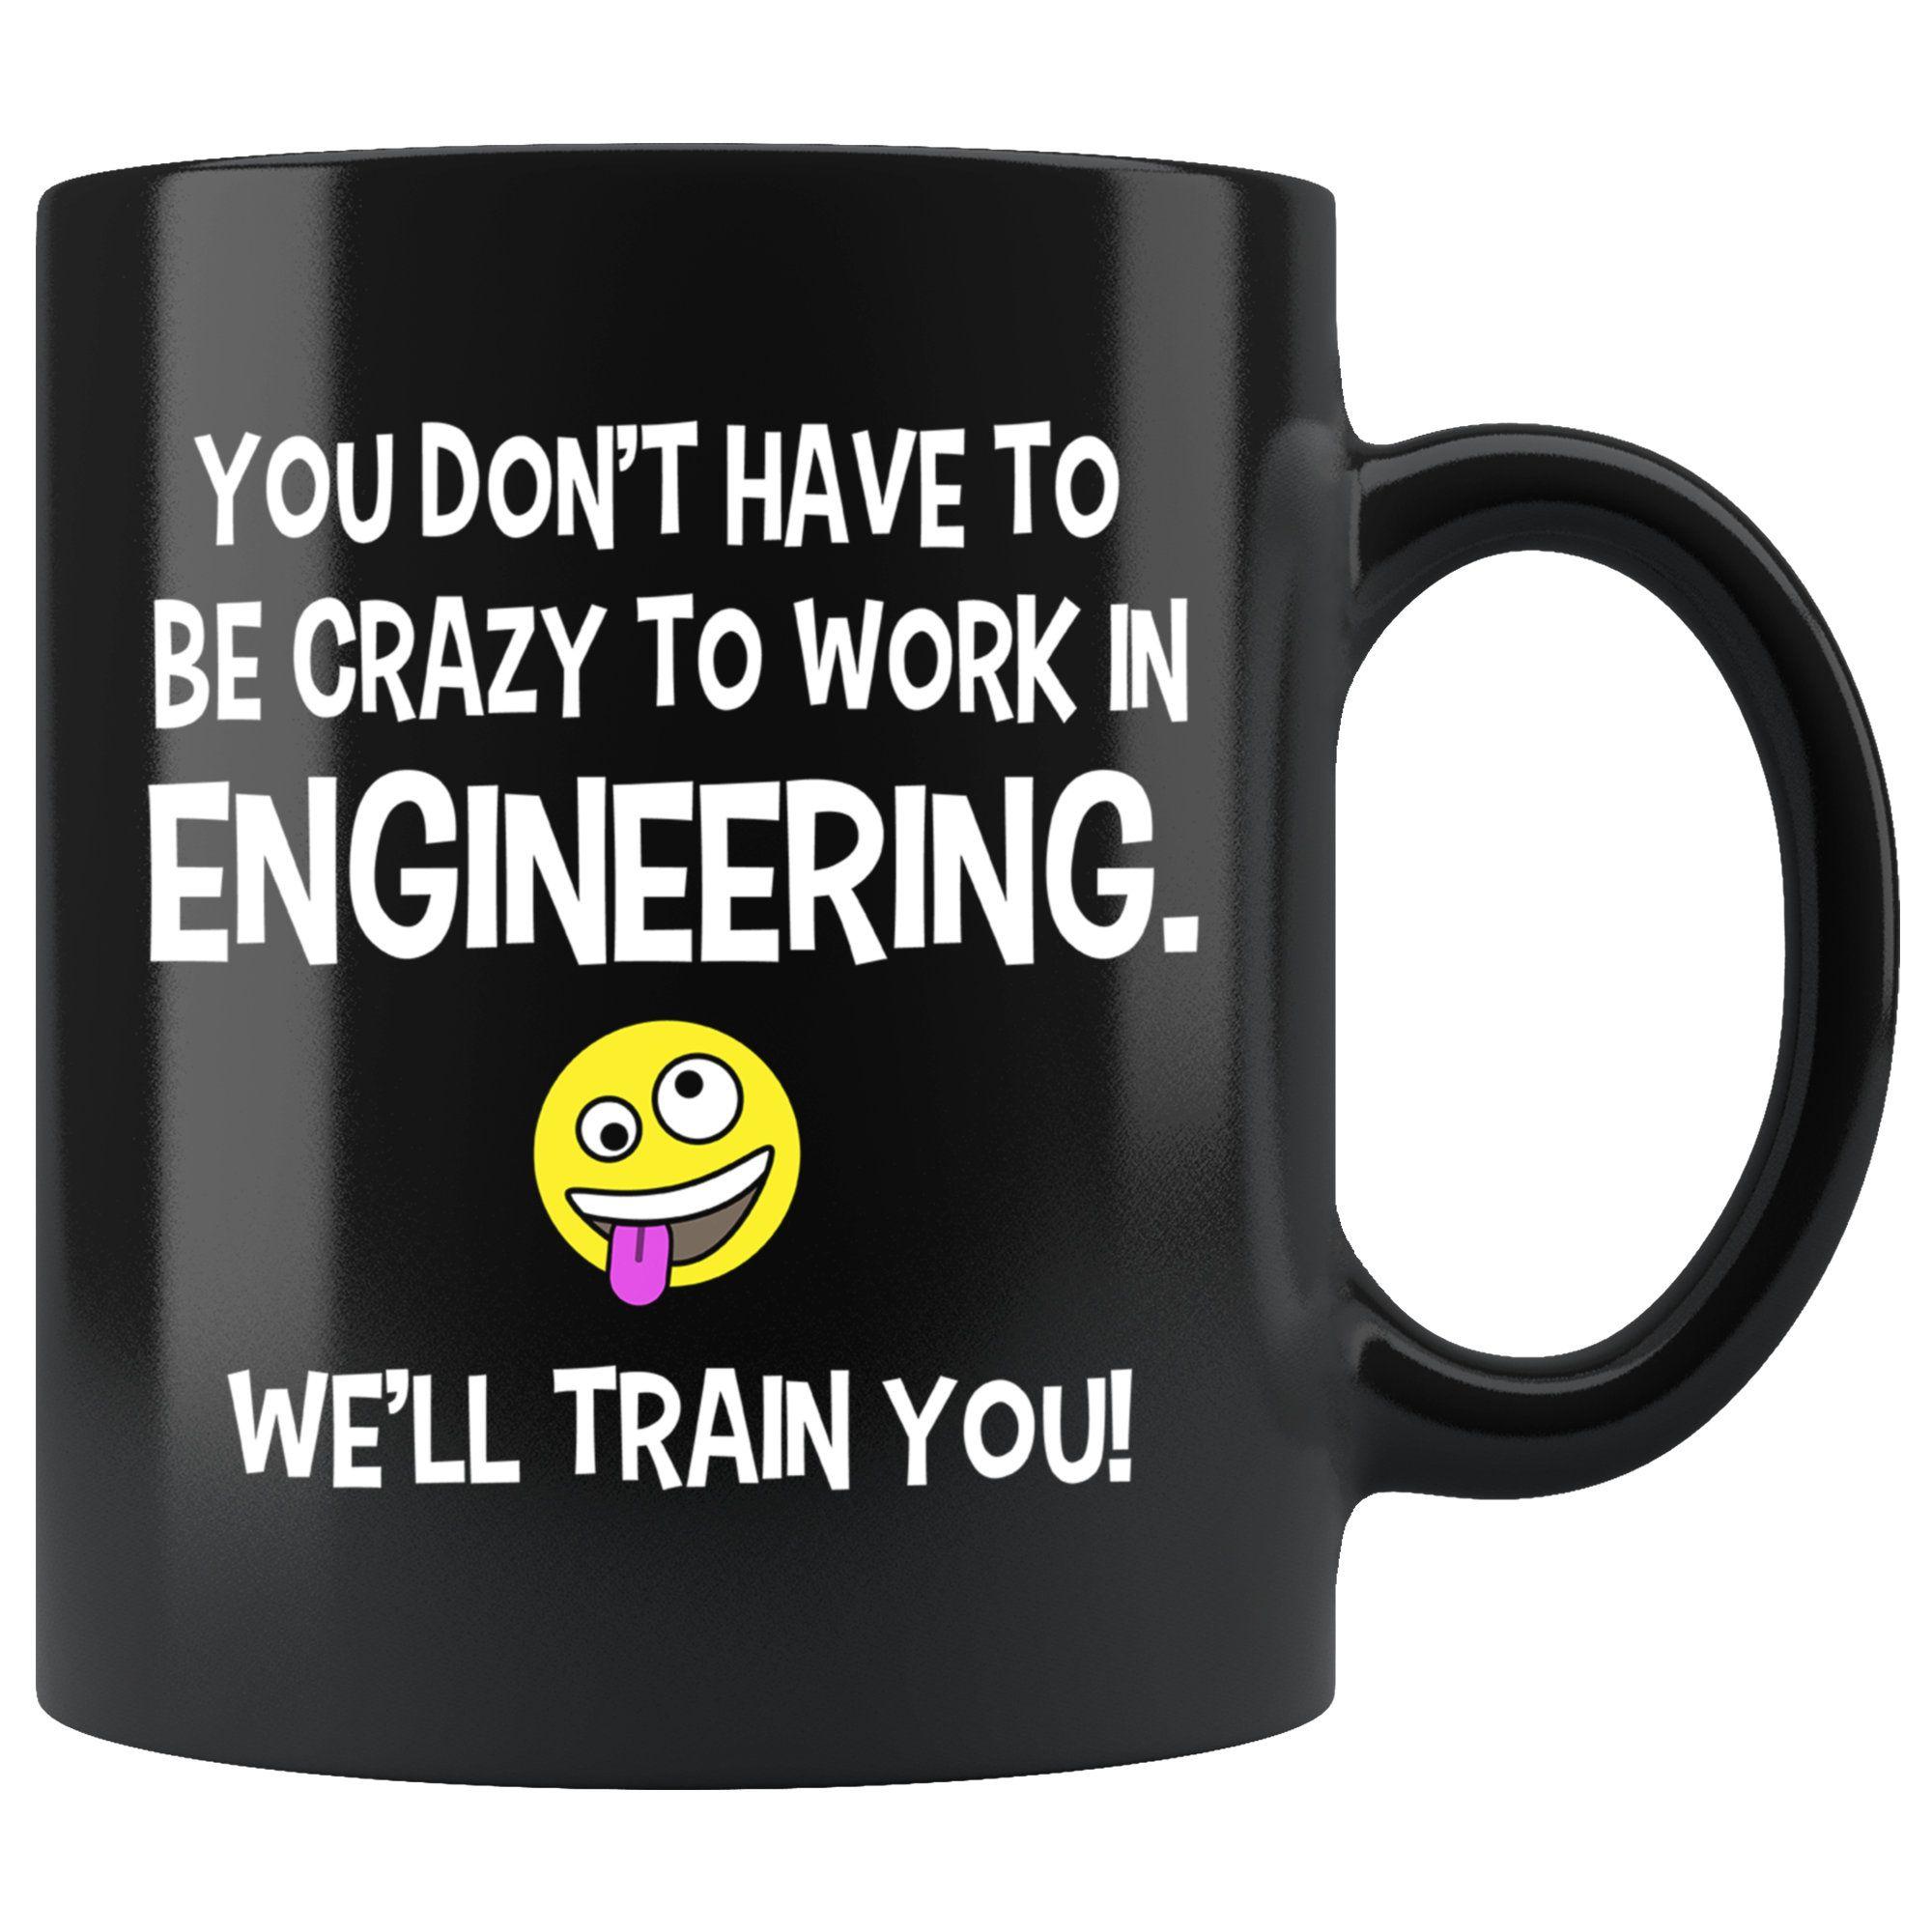 Crazy to work in engineering coffee mug funny engineer mug